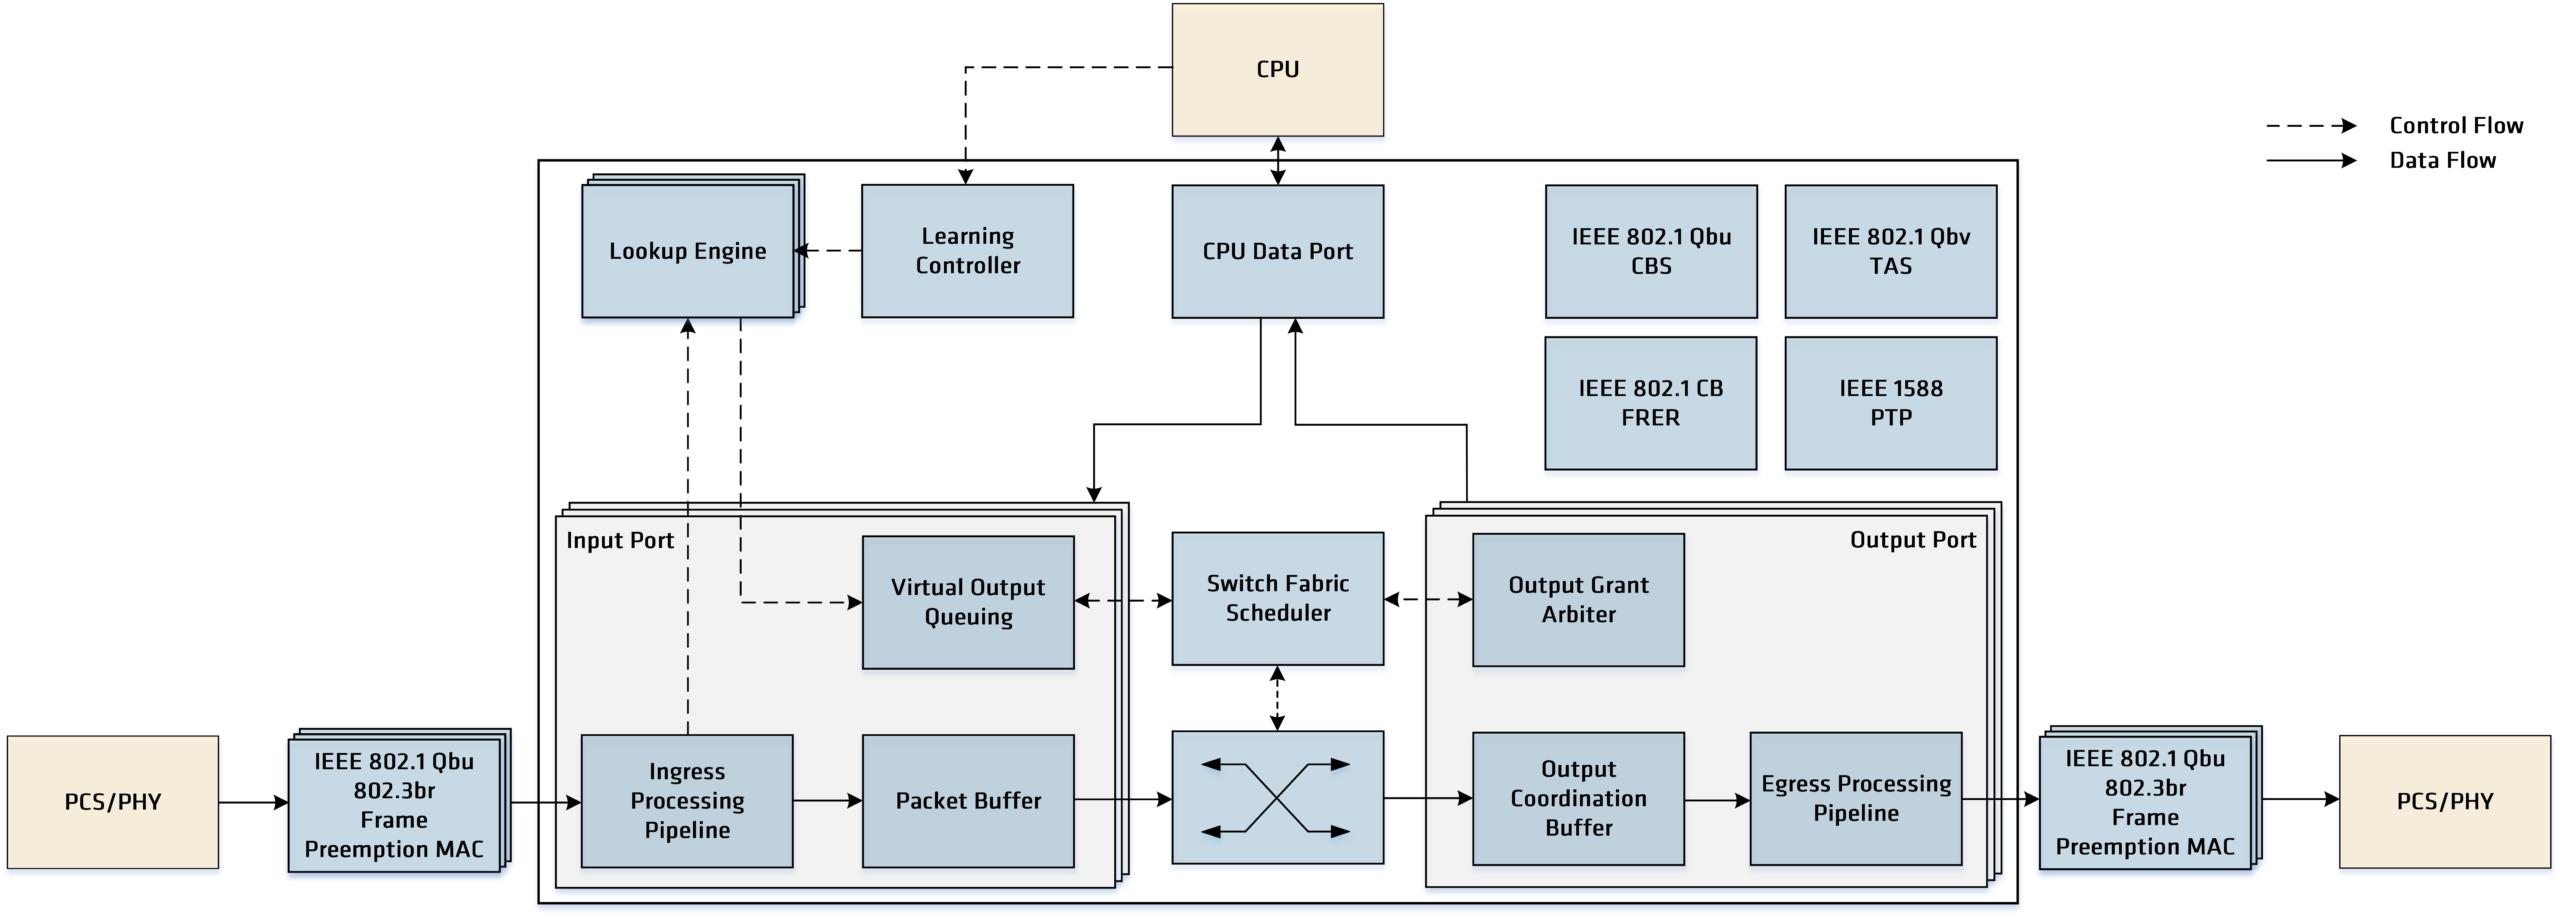 Manticore - 10M/100M/1G/10G/25G Advanced TSN Switch Block Diagram